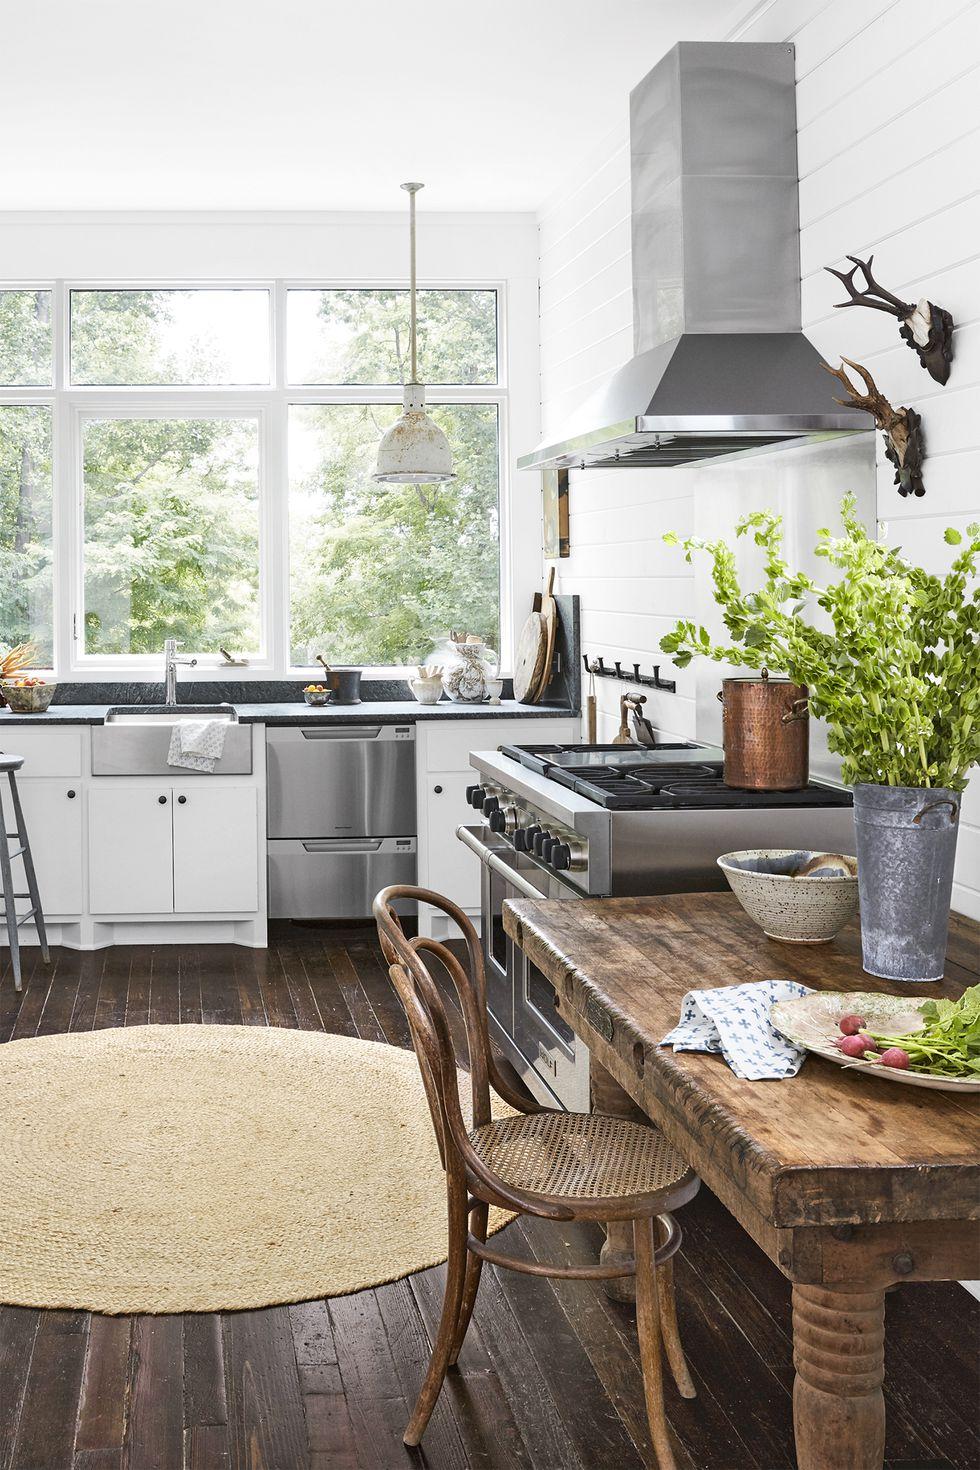 lofty-intentions-kitchen-1018-1542138245.jpg